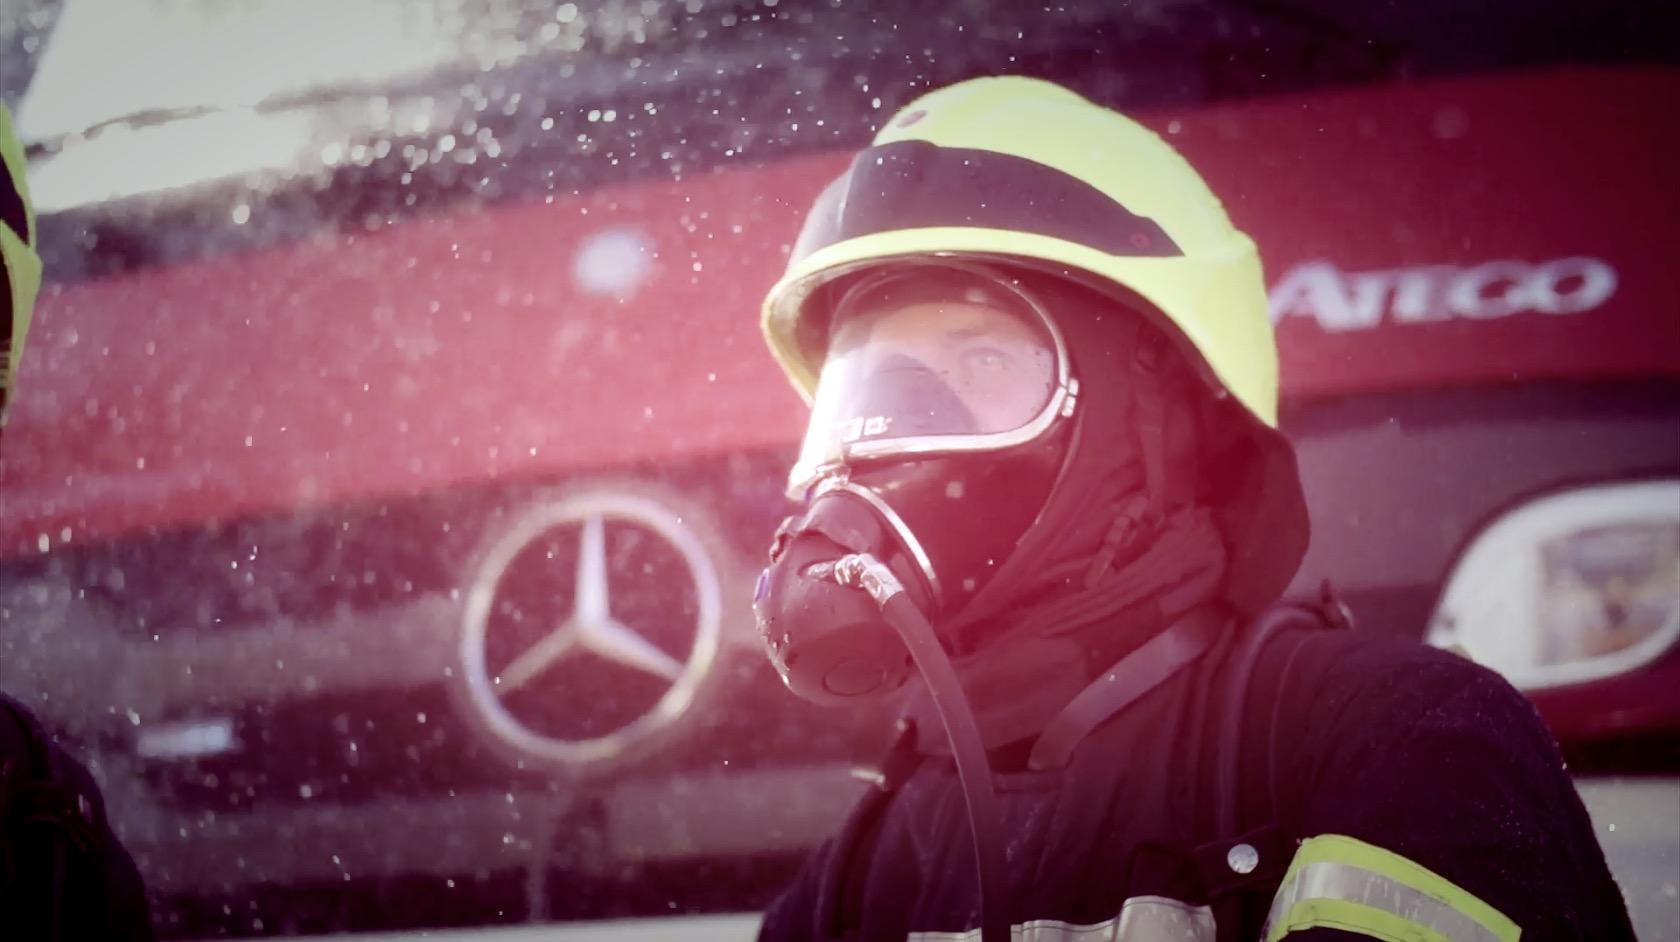 Mercedes-Benz_Interschutz_Trailer_by_Jarek_Raczek_WEB